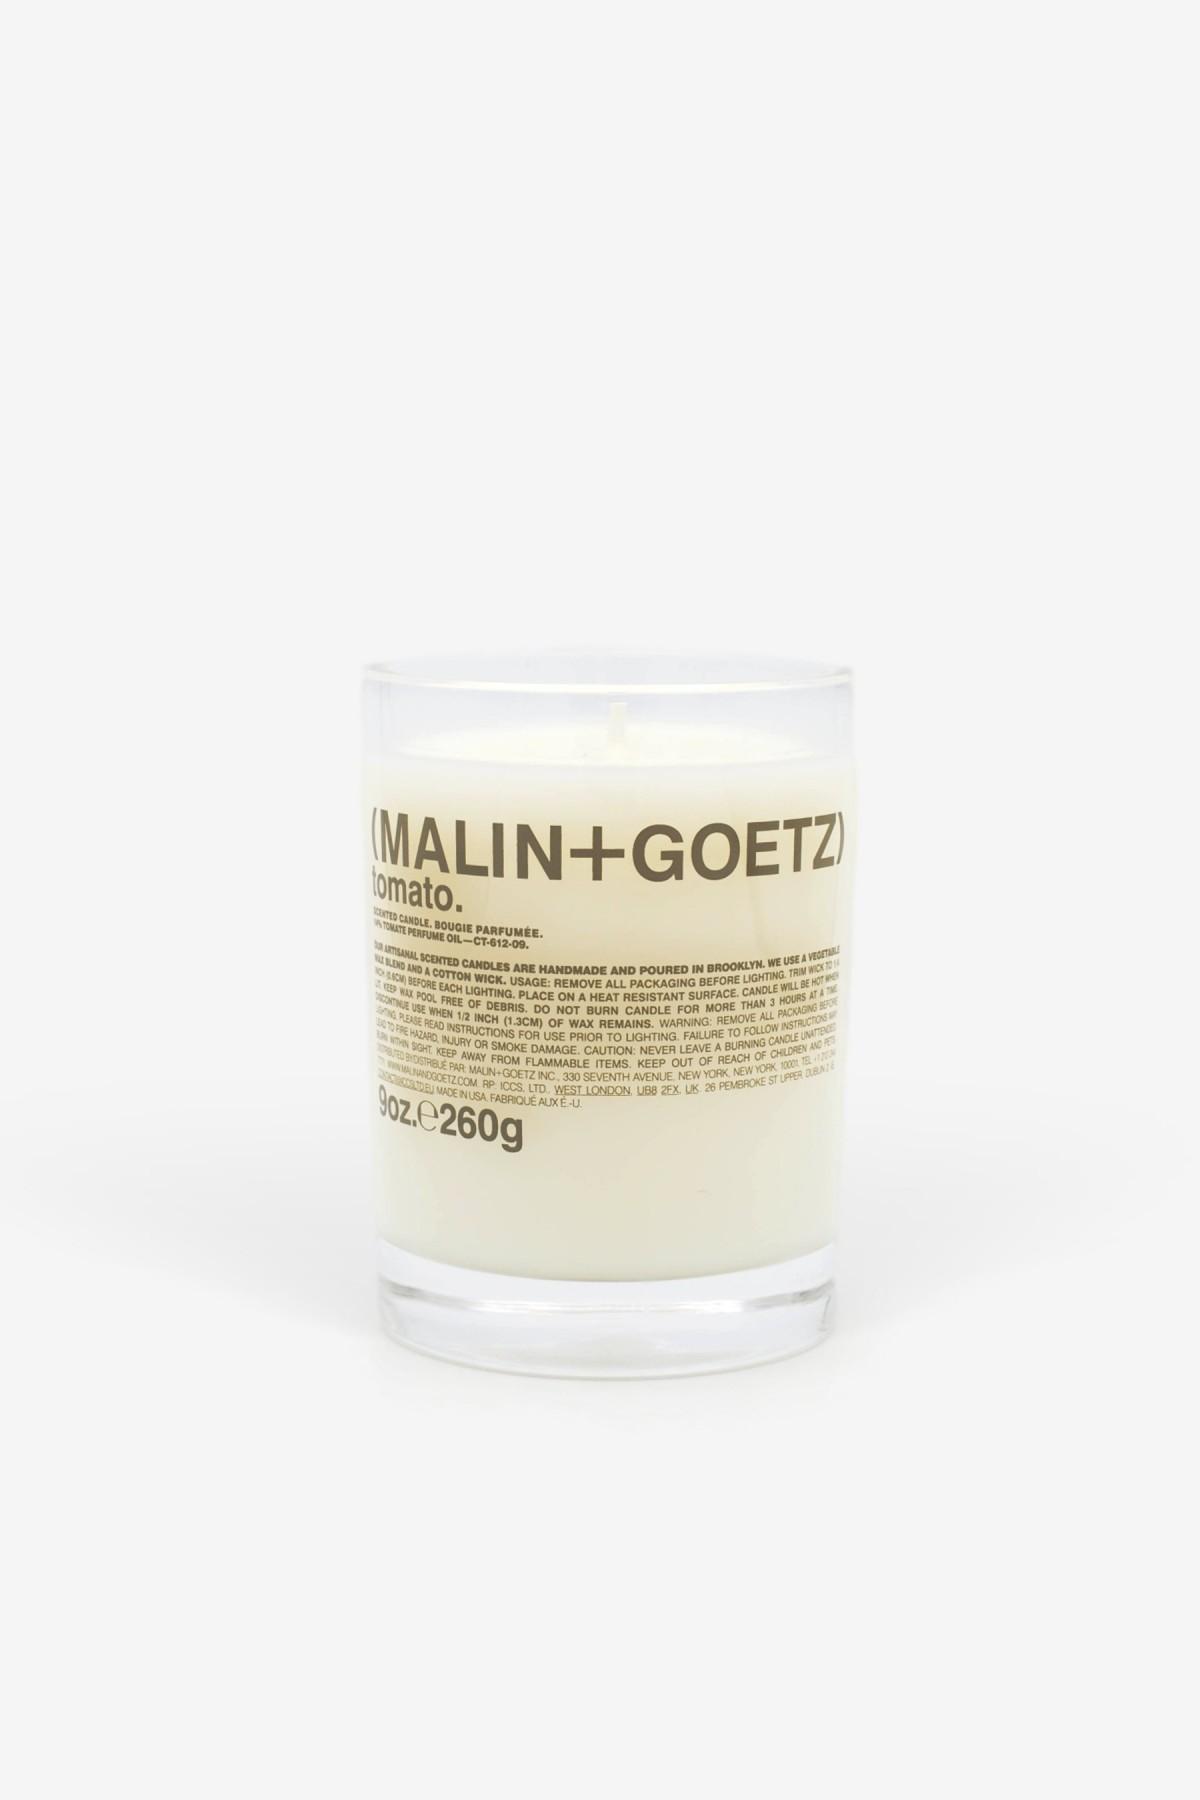 Malin+Goetz Tomato Candle 260g in